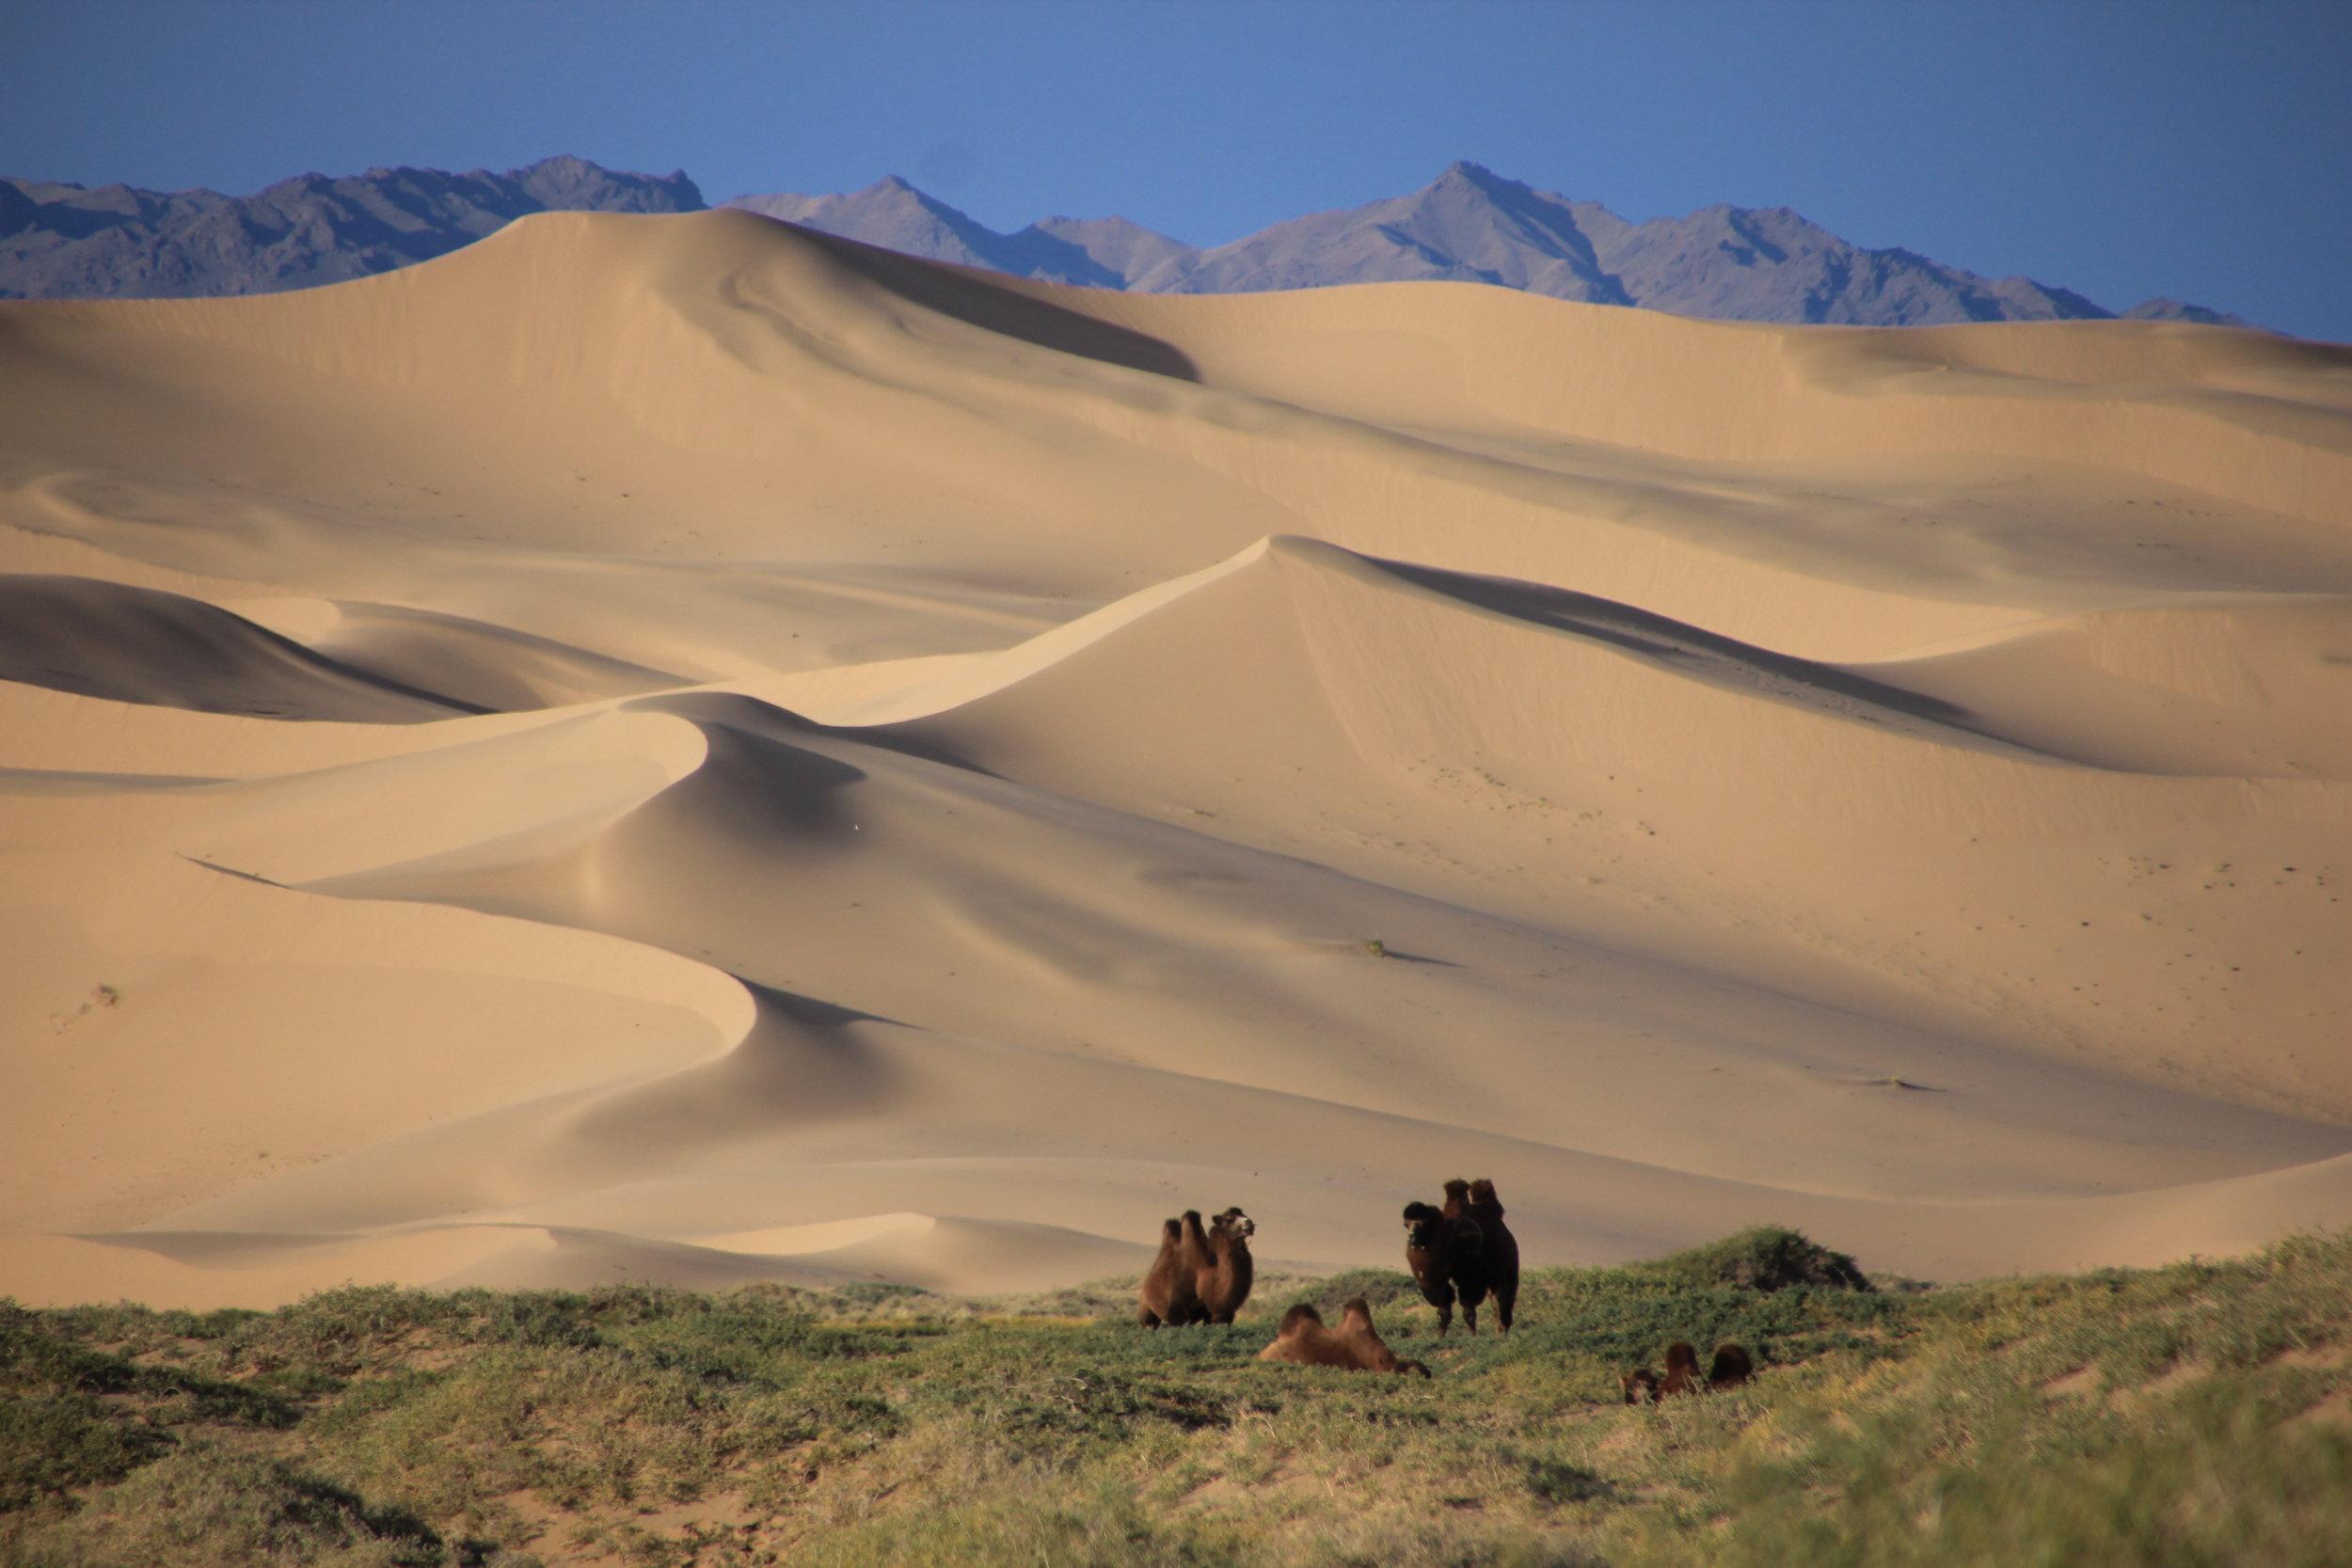 The Gobi